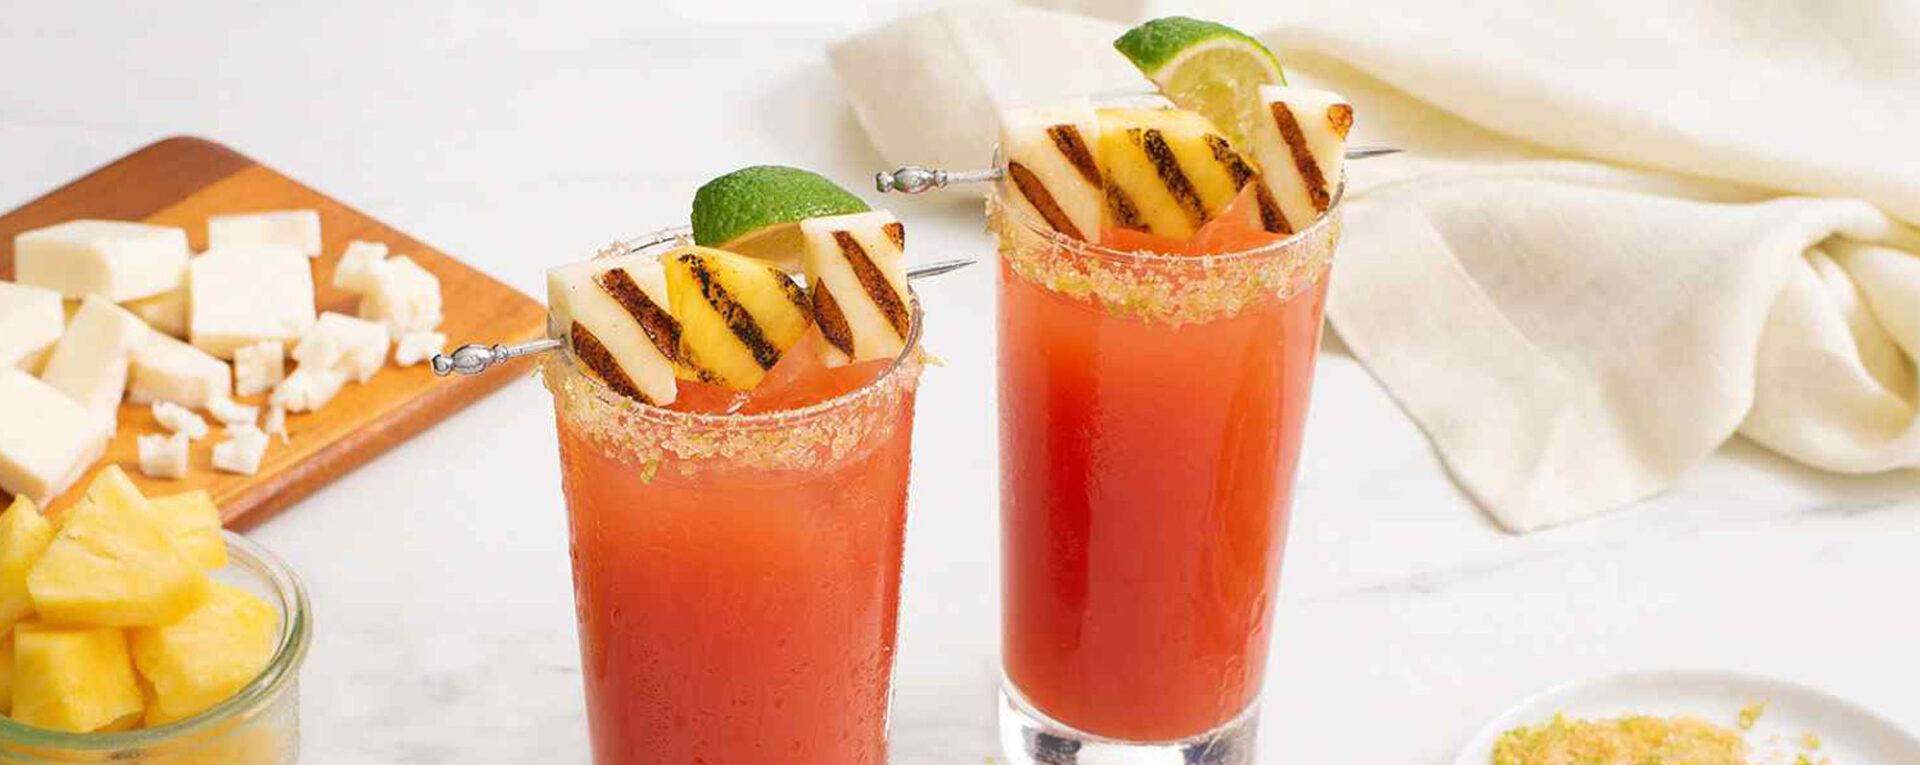 Bloody Caesar à l'ananas avec halloumi grillé